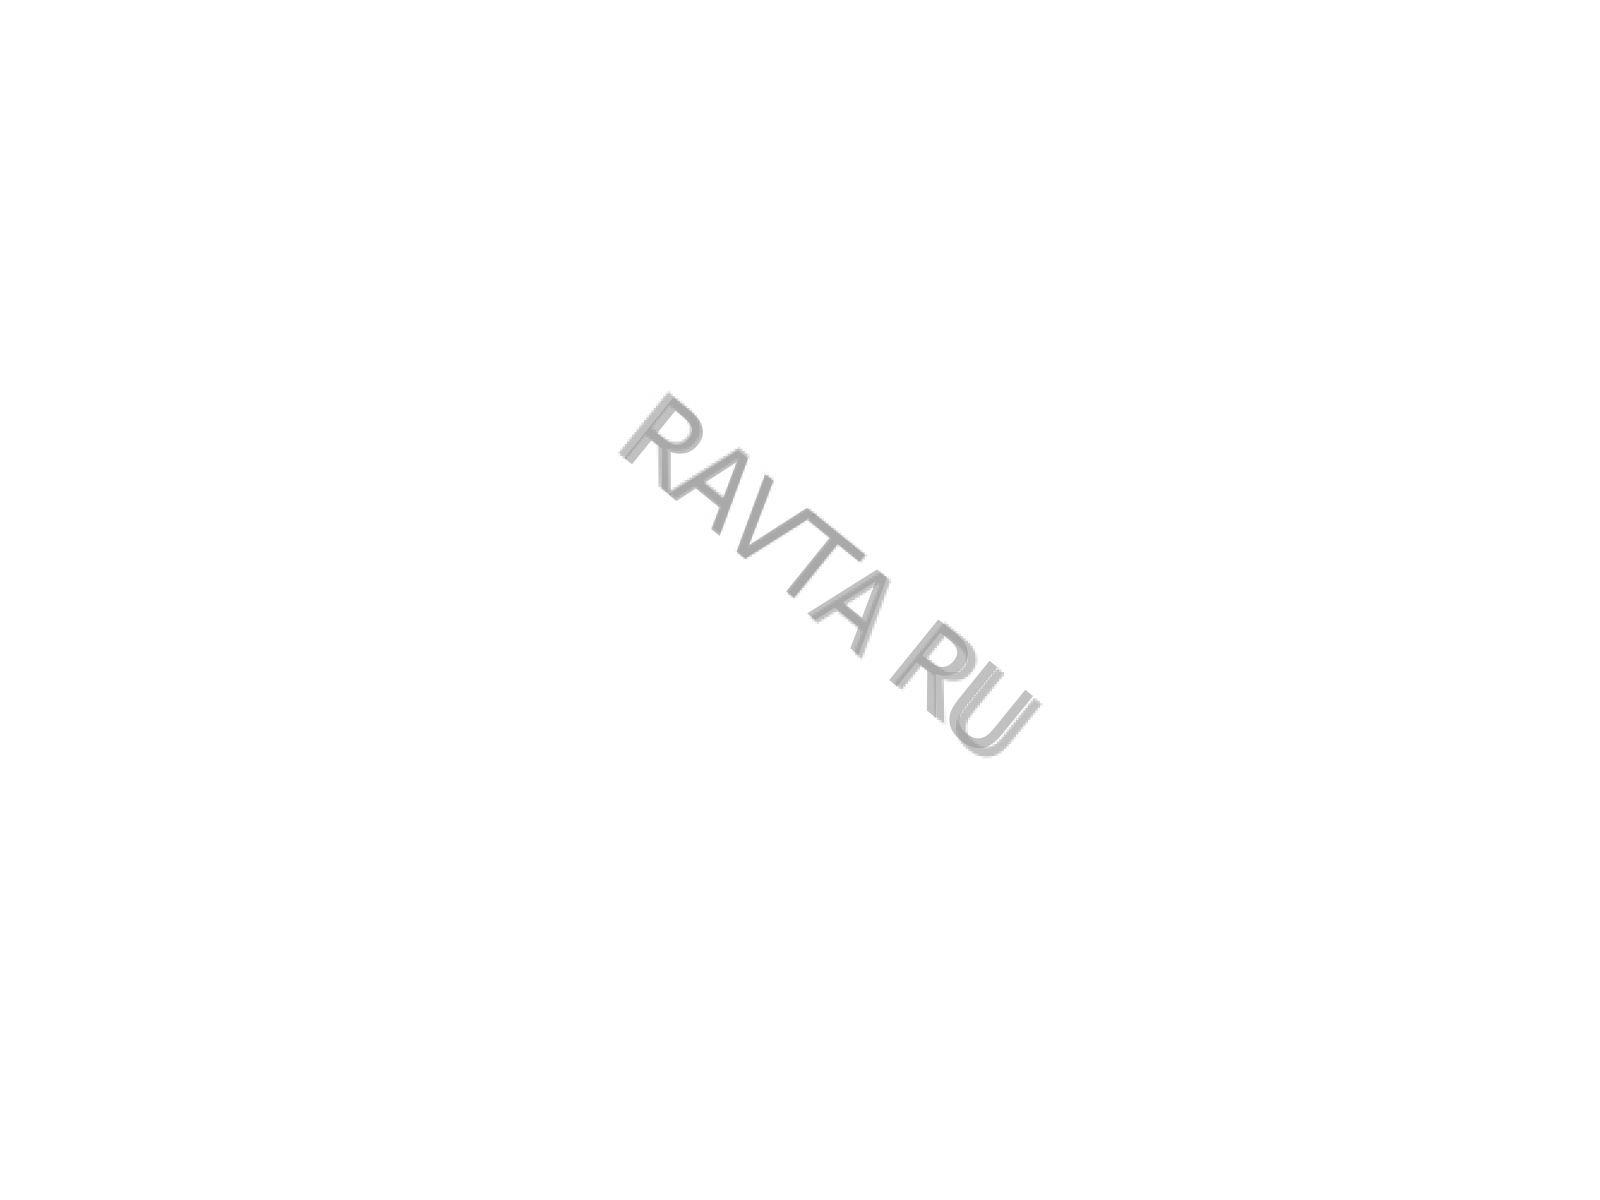 Смазка Shell Gadus S2 V220 AD2 (18кг) от Ravta